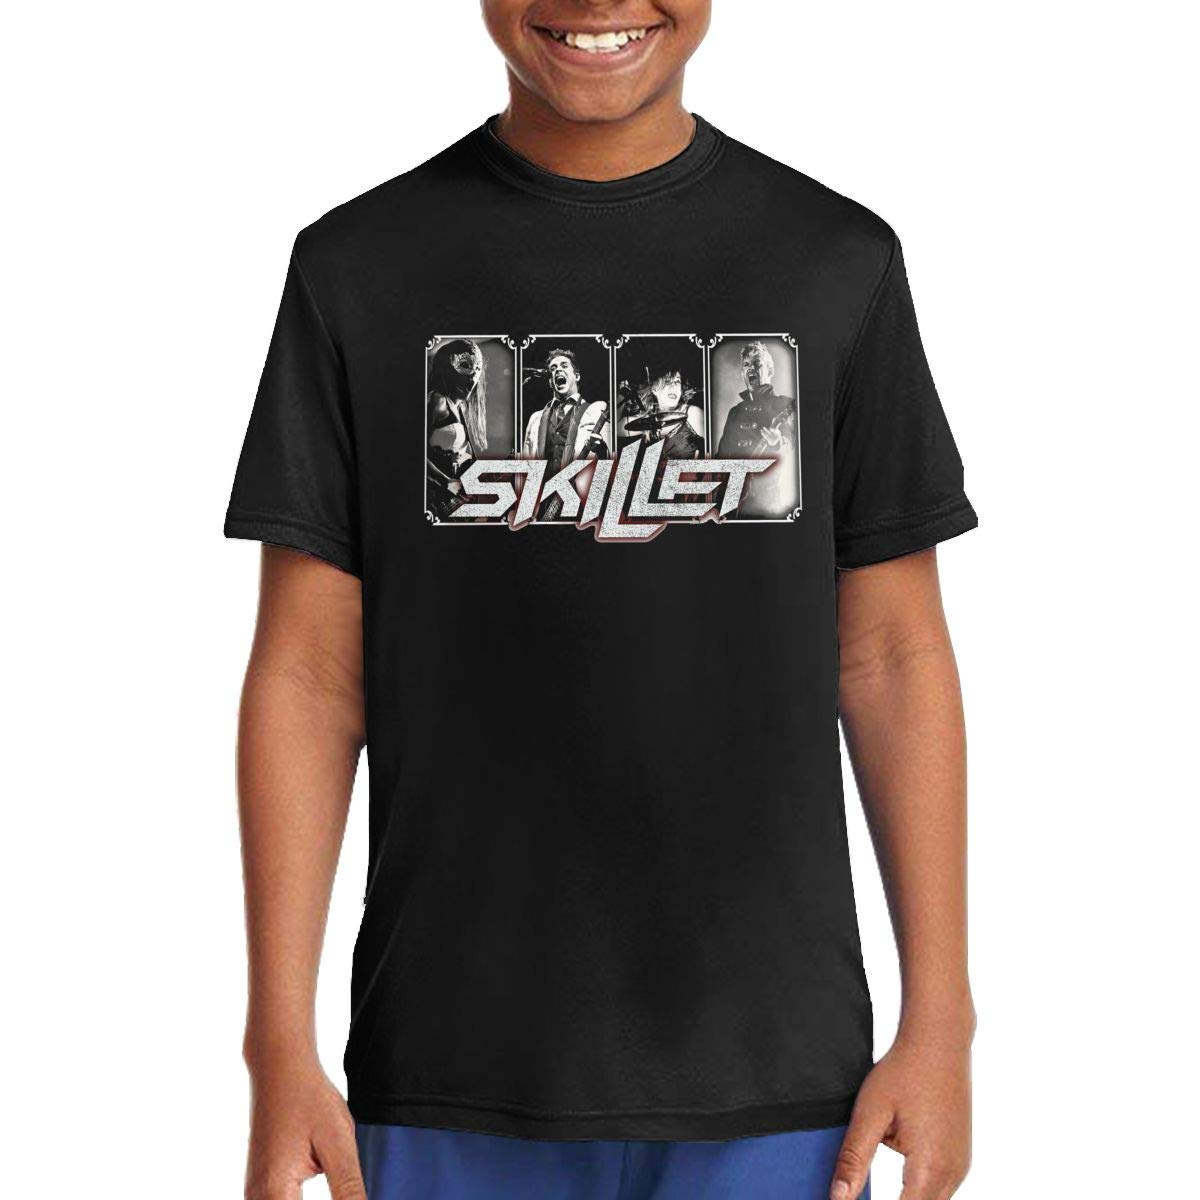 Skillet Band Mens Fashion Athletic Casual Hoodies Long Sleeves Loose Fit Sweatshirt with Kangaroo Pocket